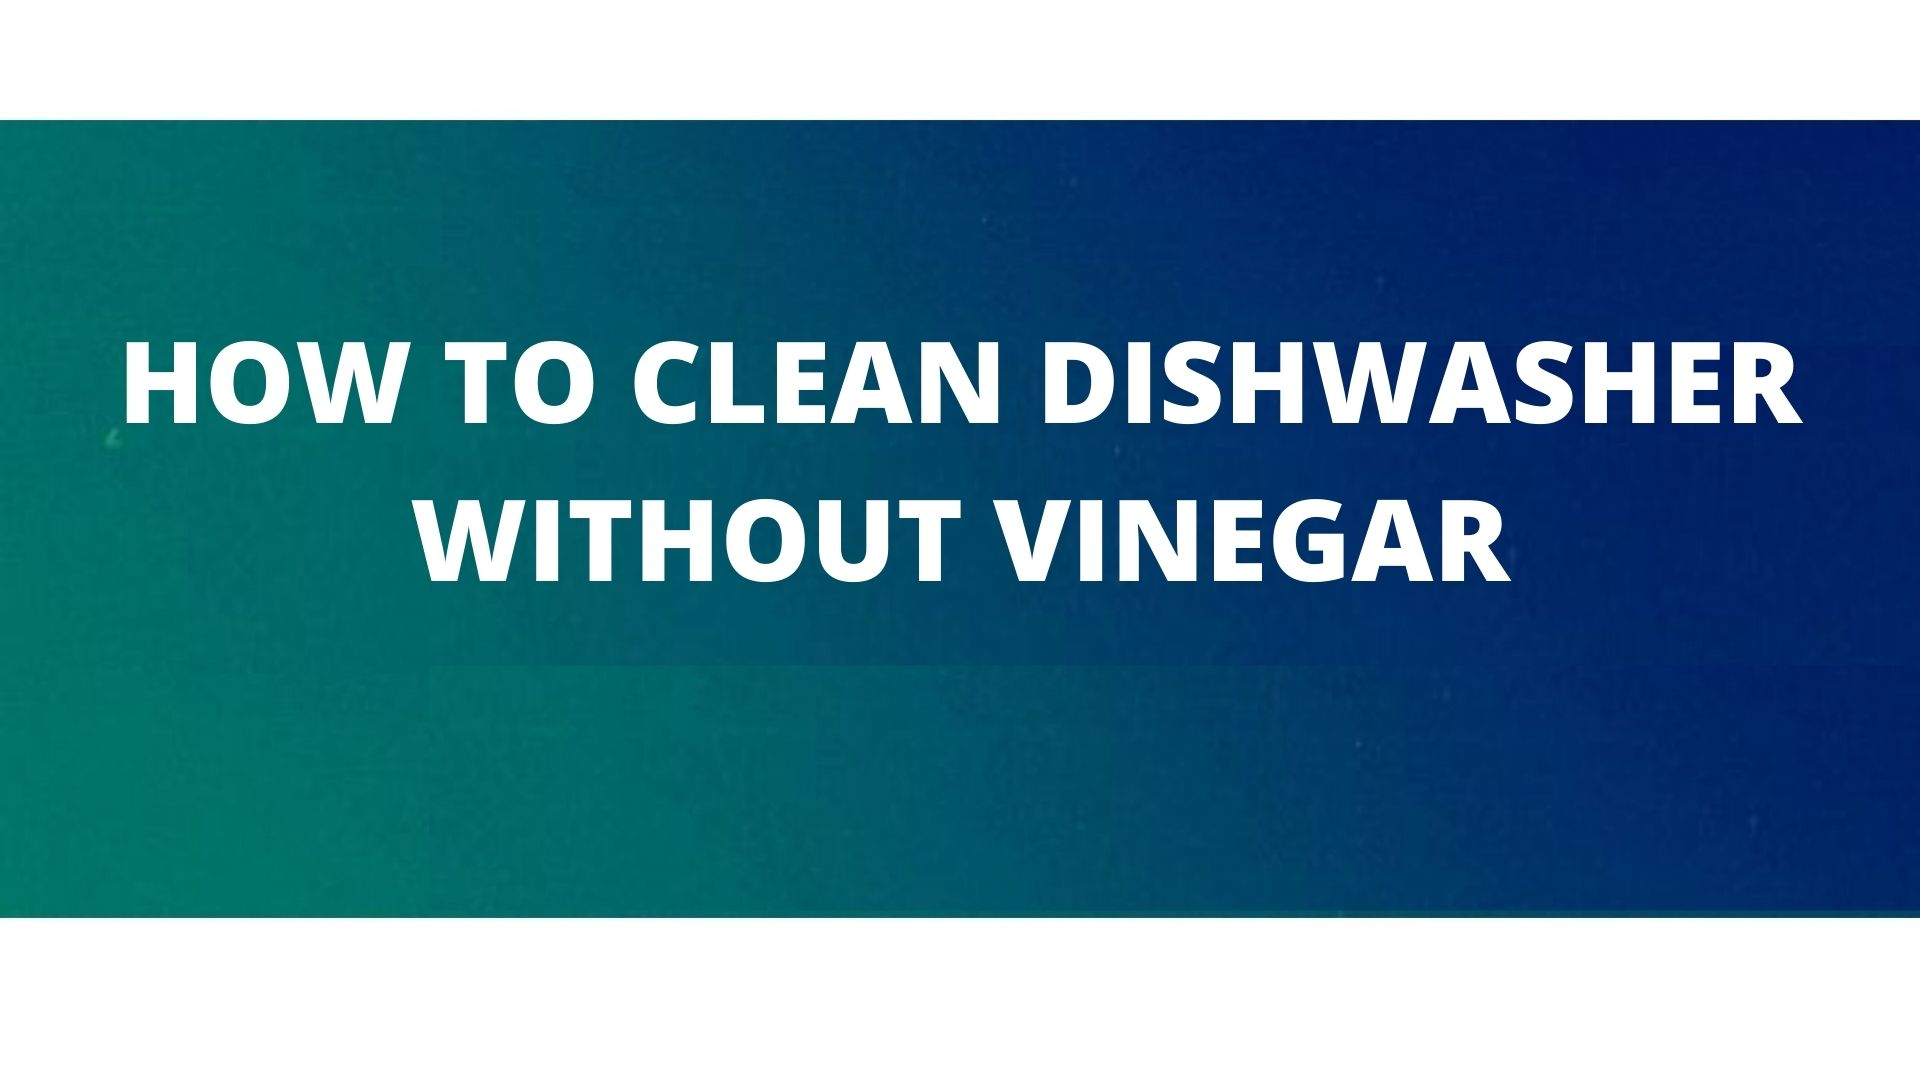 Usage of vinegar for cleaning dishwasher